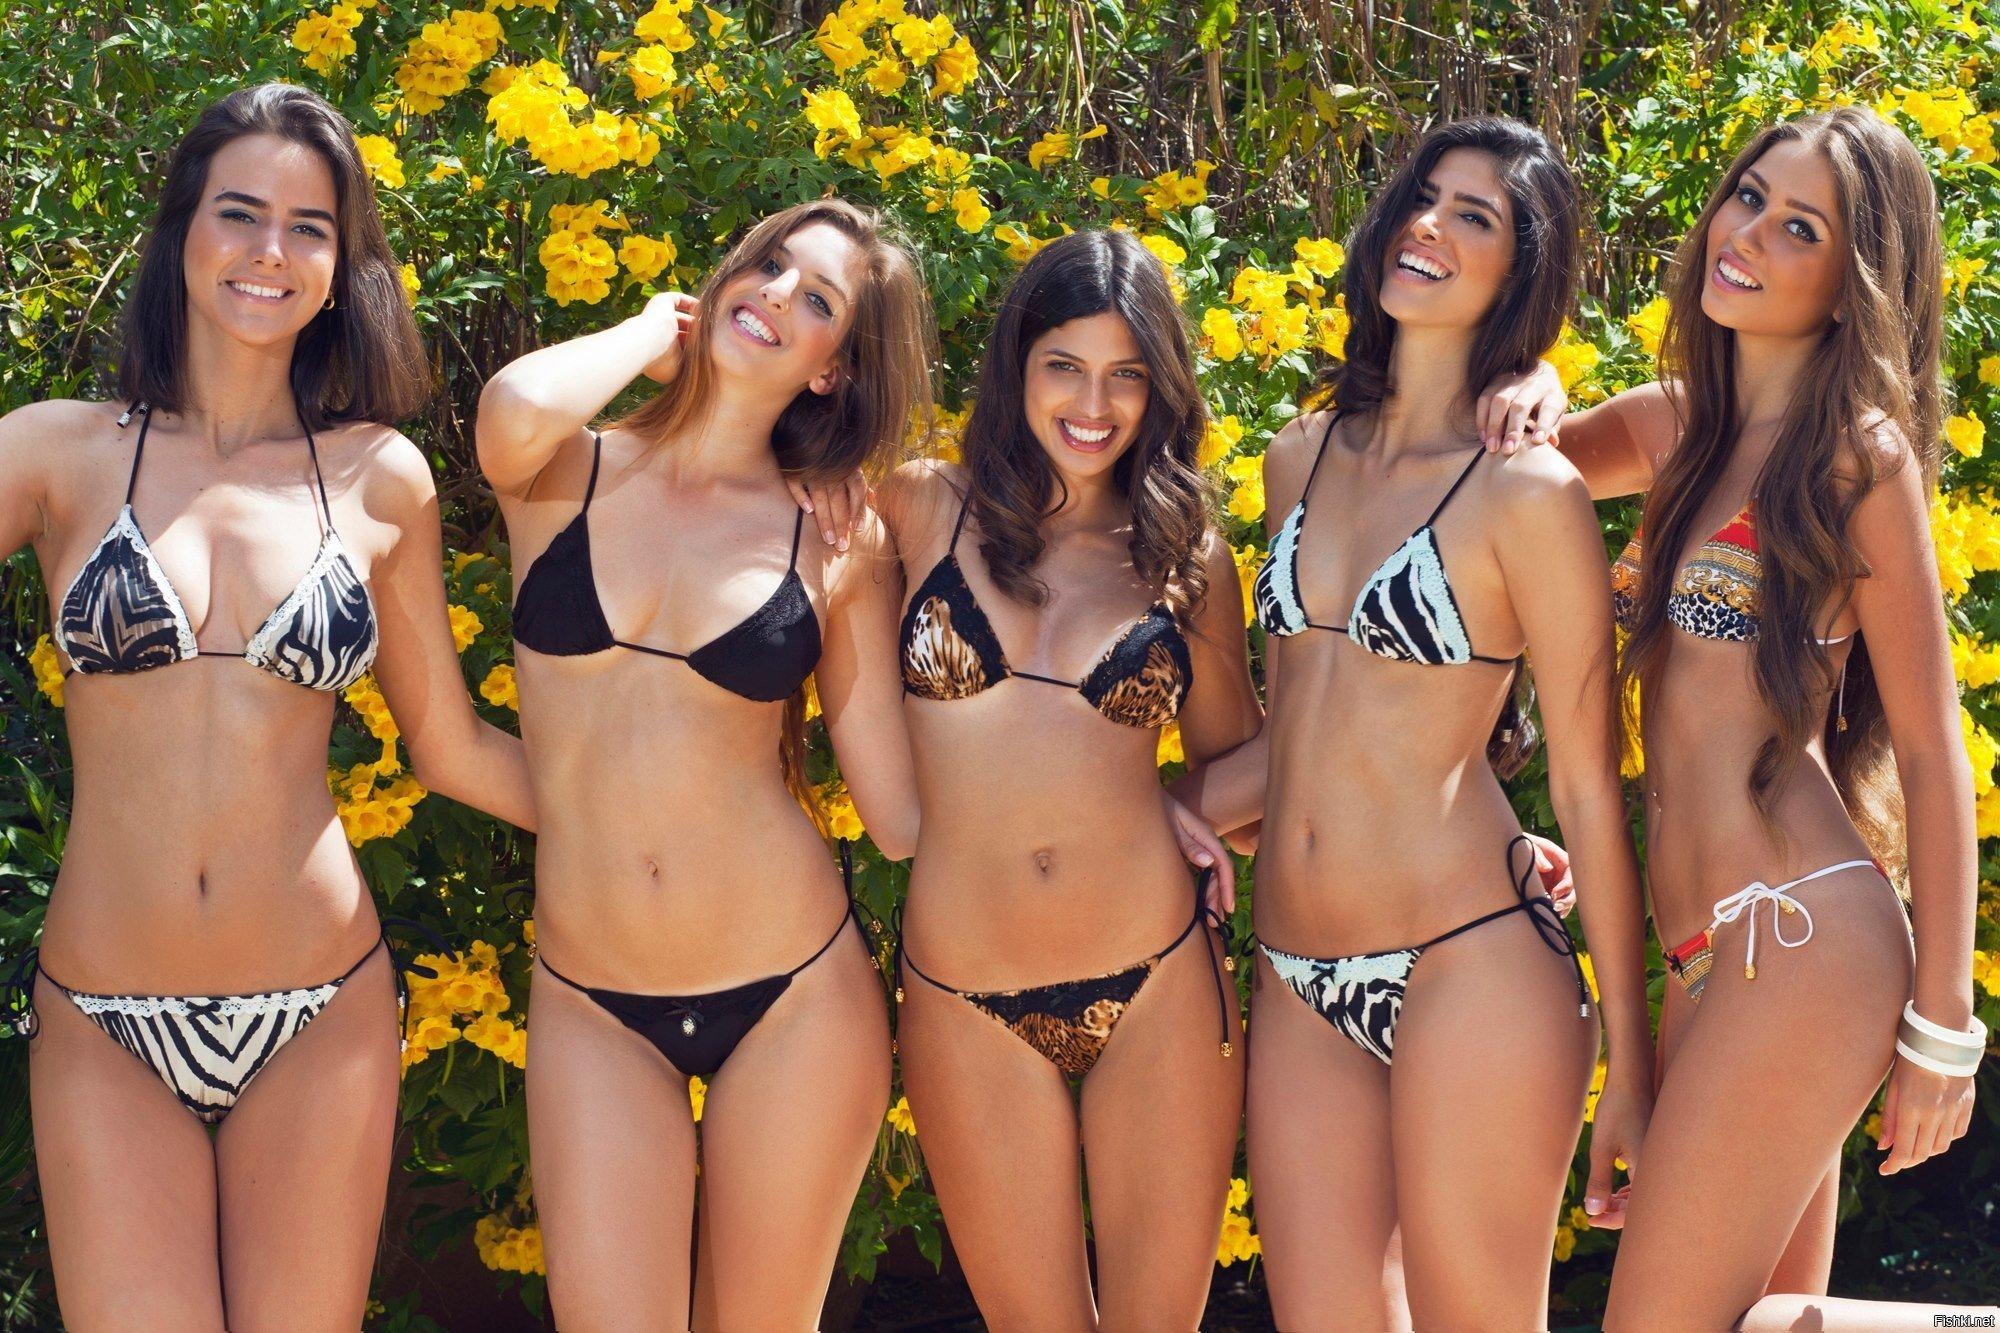 English girls in bikinis